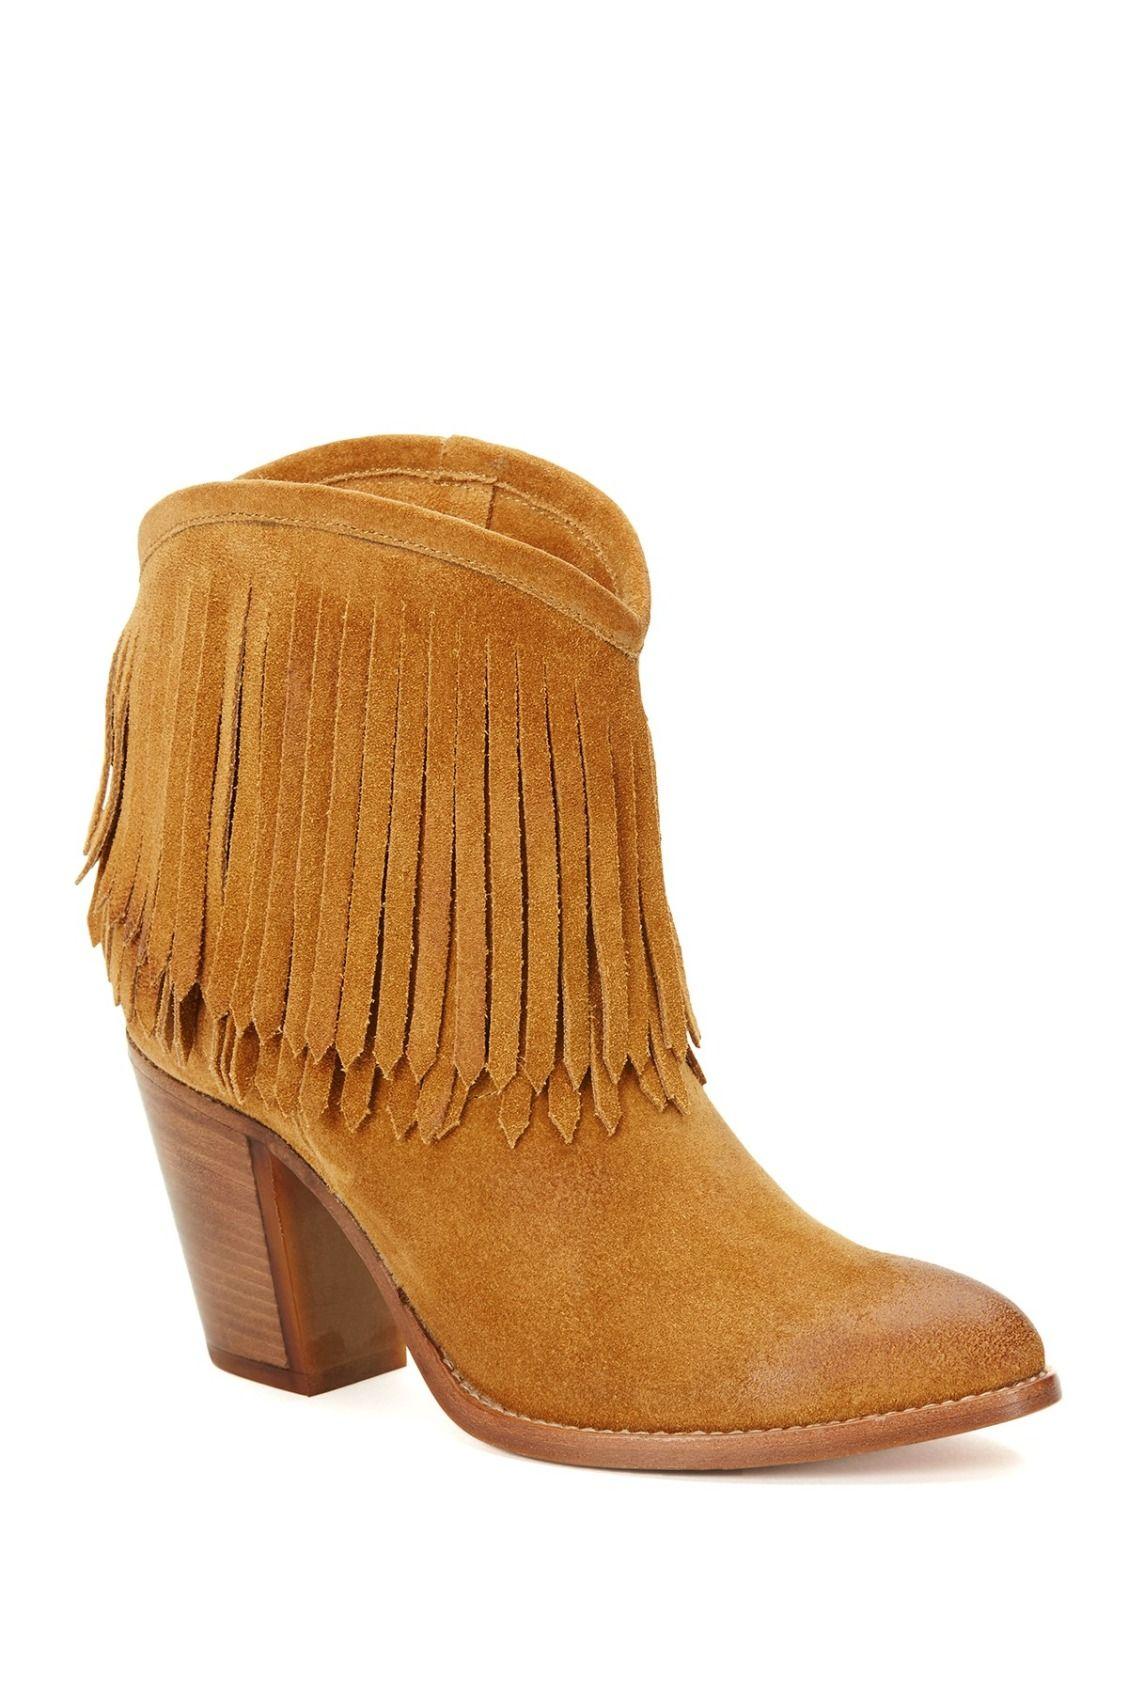 37b859d9dec Fringe fun! Frye Ilana Fringe Short Boots